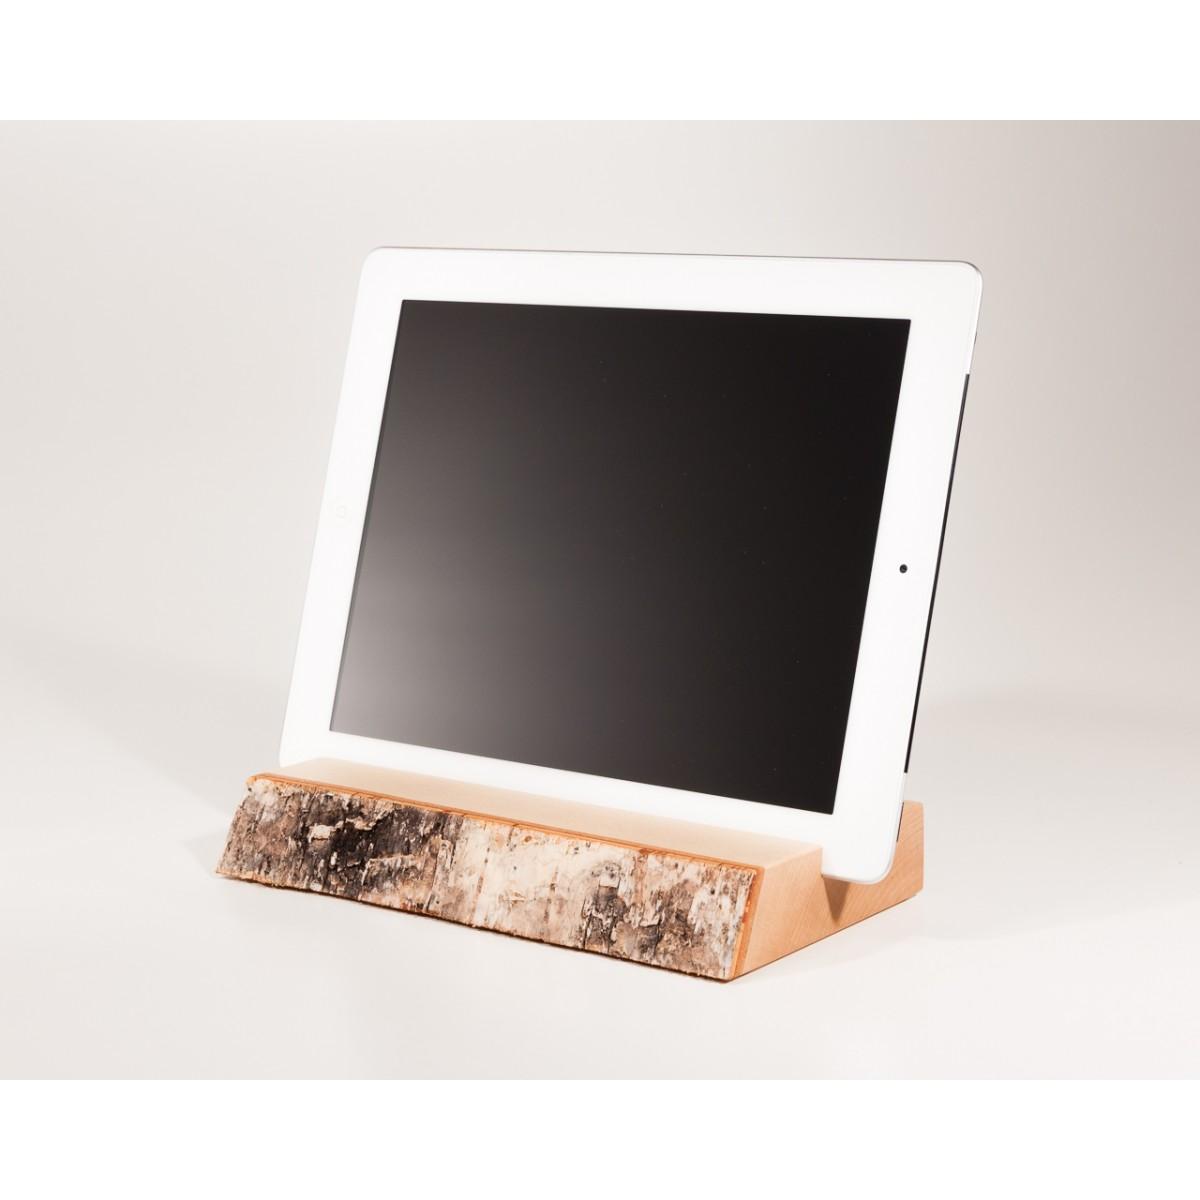 wood u halterung halter f r ipad und tablet aus holz. Black Bedroom Furniture Sets. Home Design Ideas